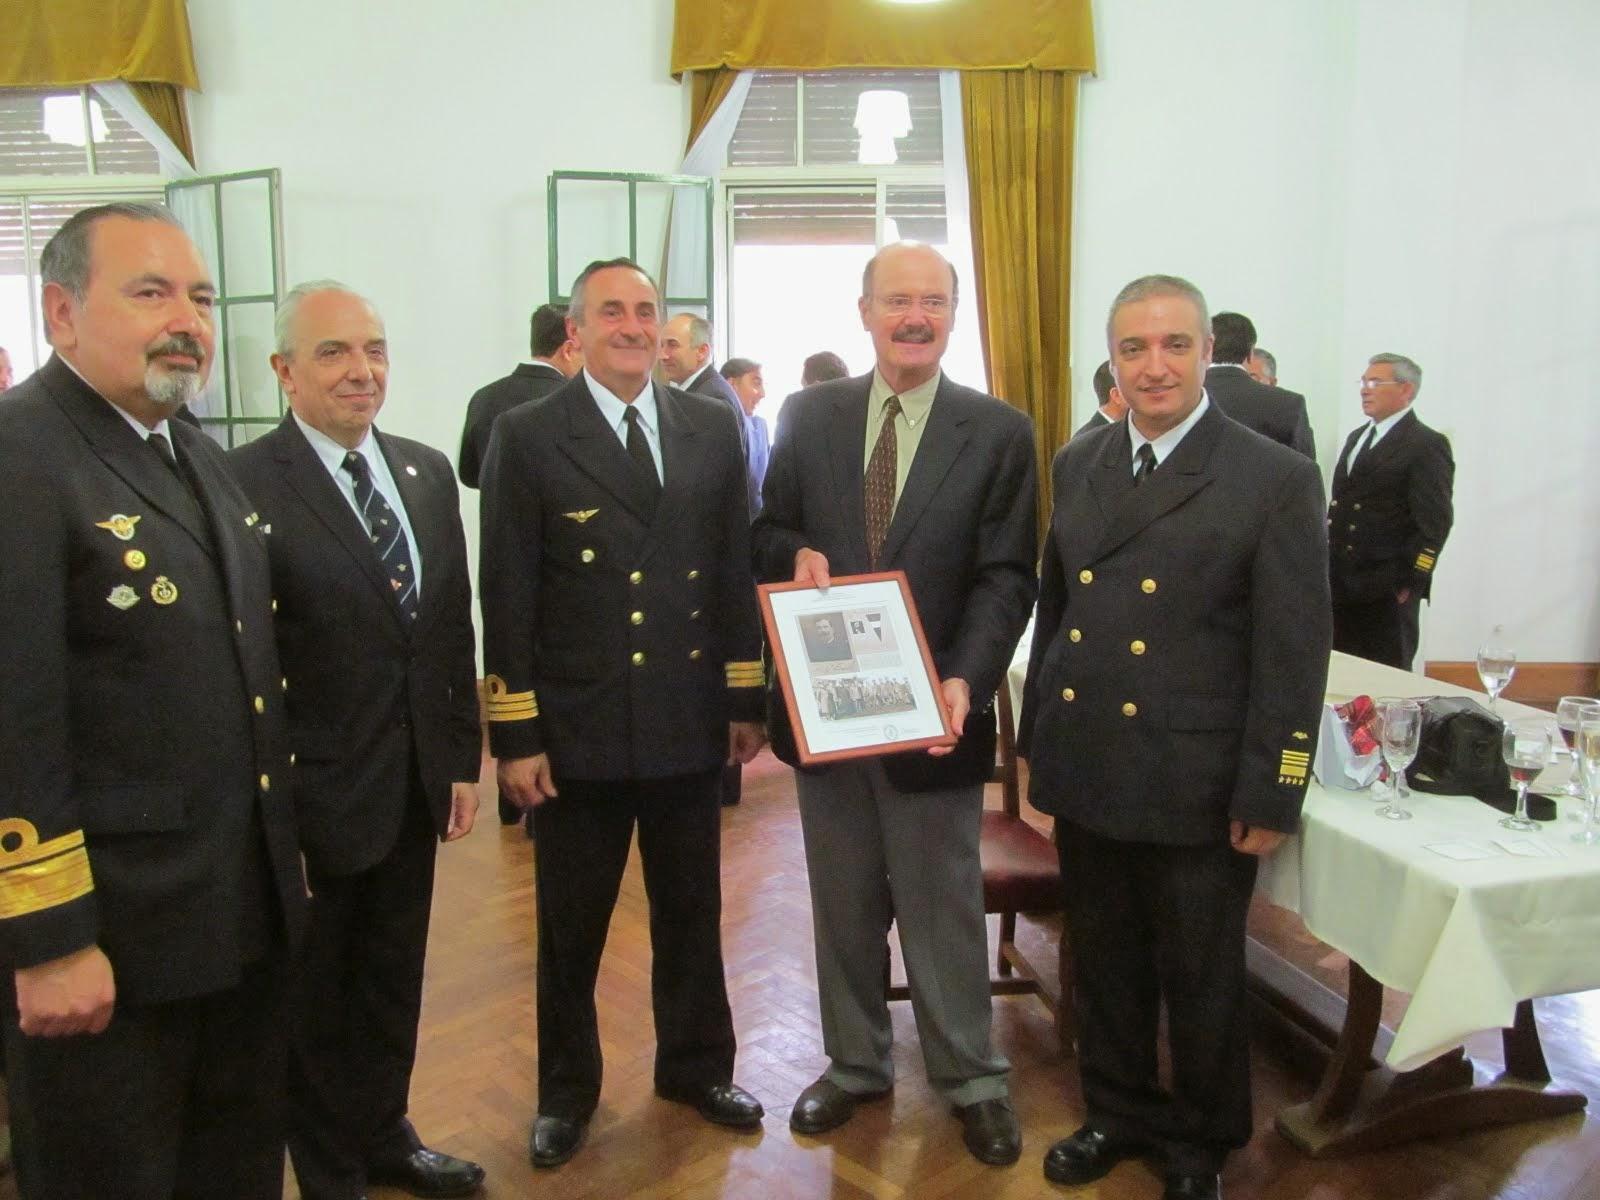 102° Aniv. Primer Brevet Militar Nacional otorgado al TF Melchor Escola (pionero de la Av. Naval)